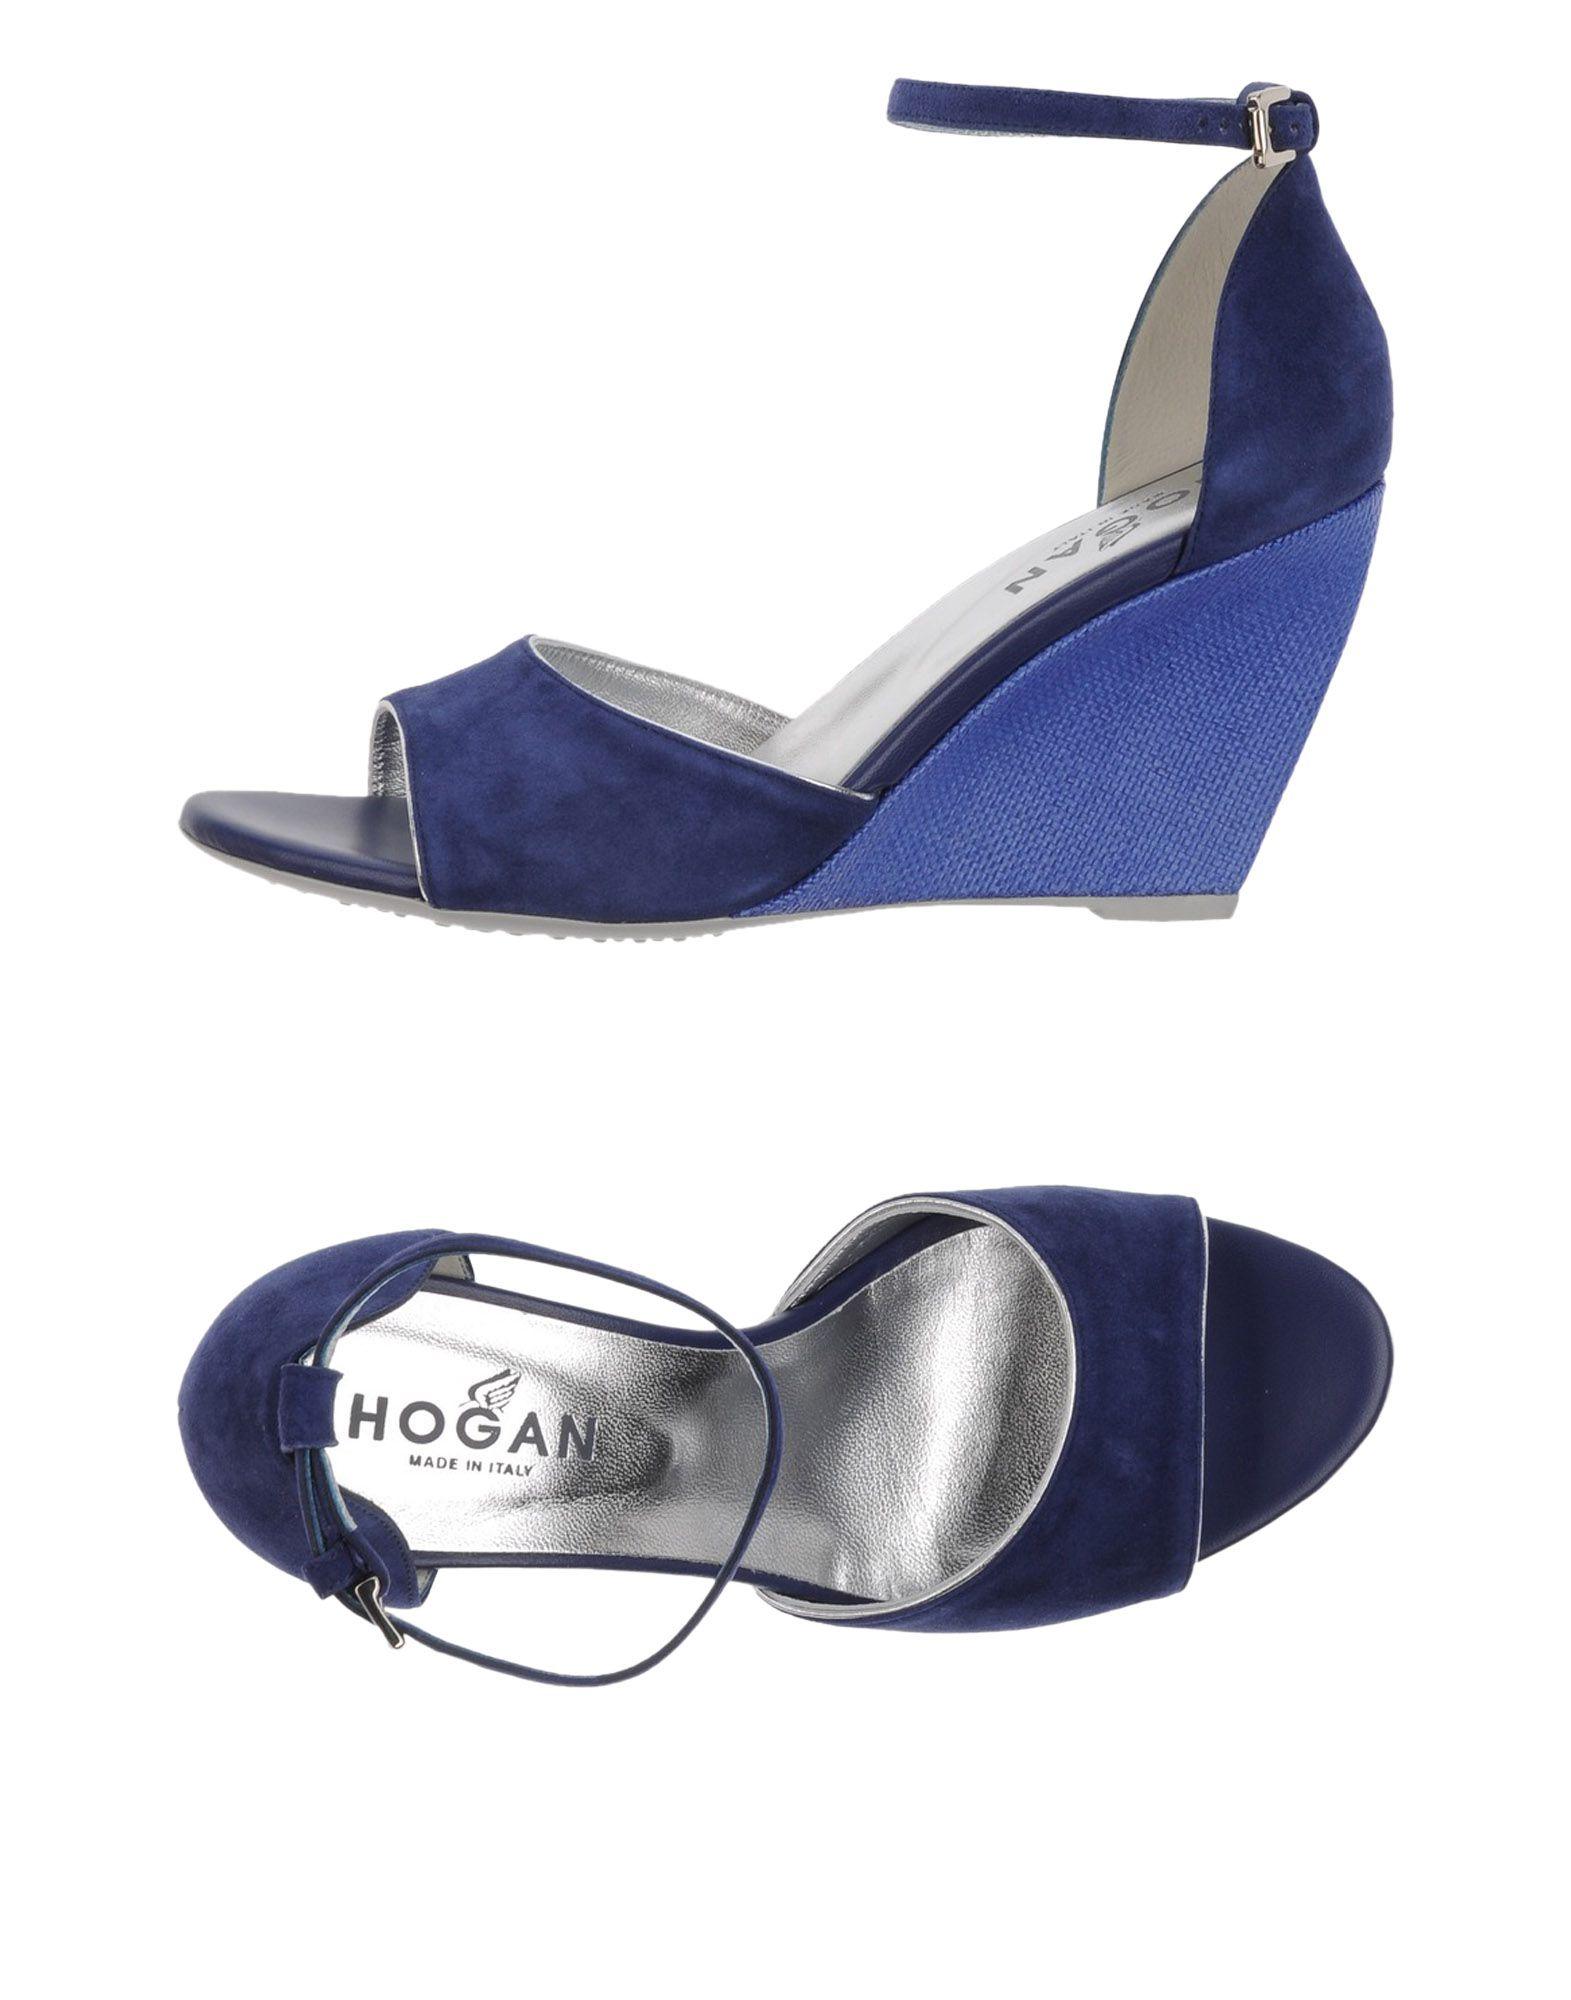 Hogan  Sandals - Women Hogan Sandals online on  Hogan United Kingdom - 11219522LS f38706